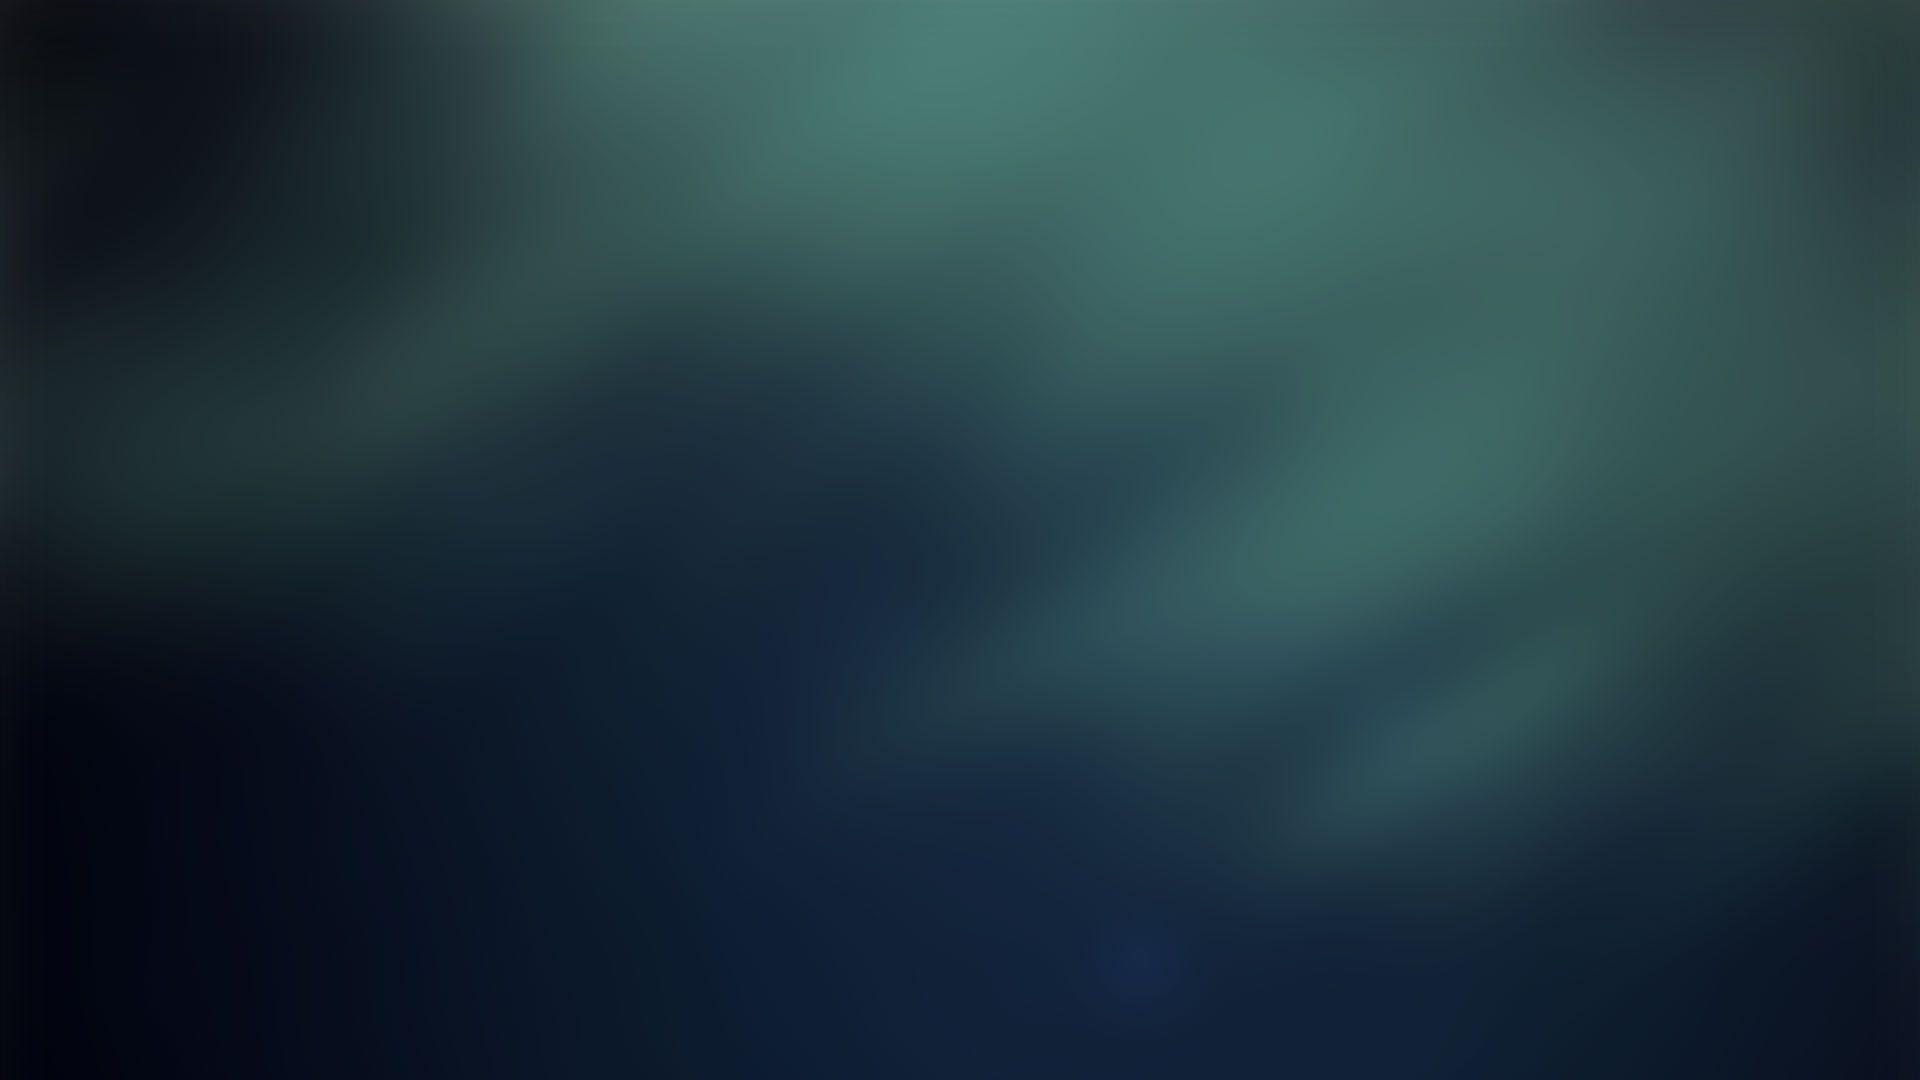 webproduct_darkbg2.jpg